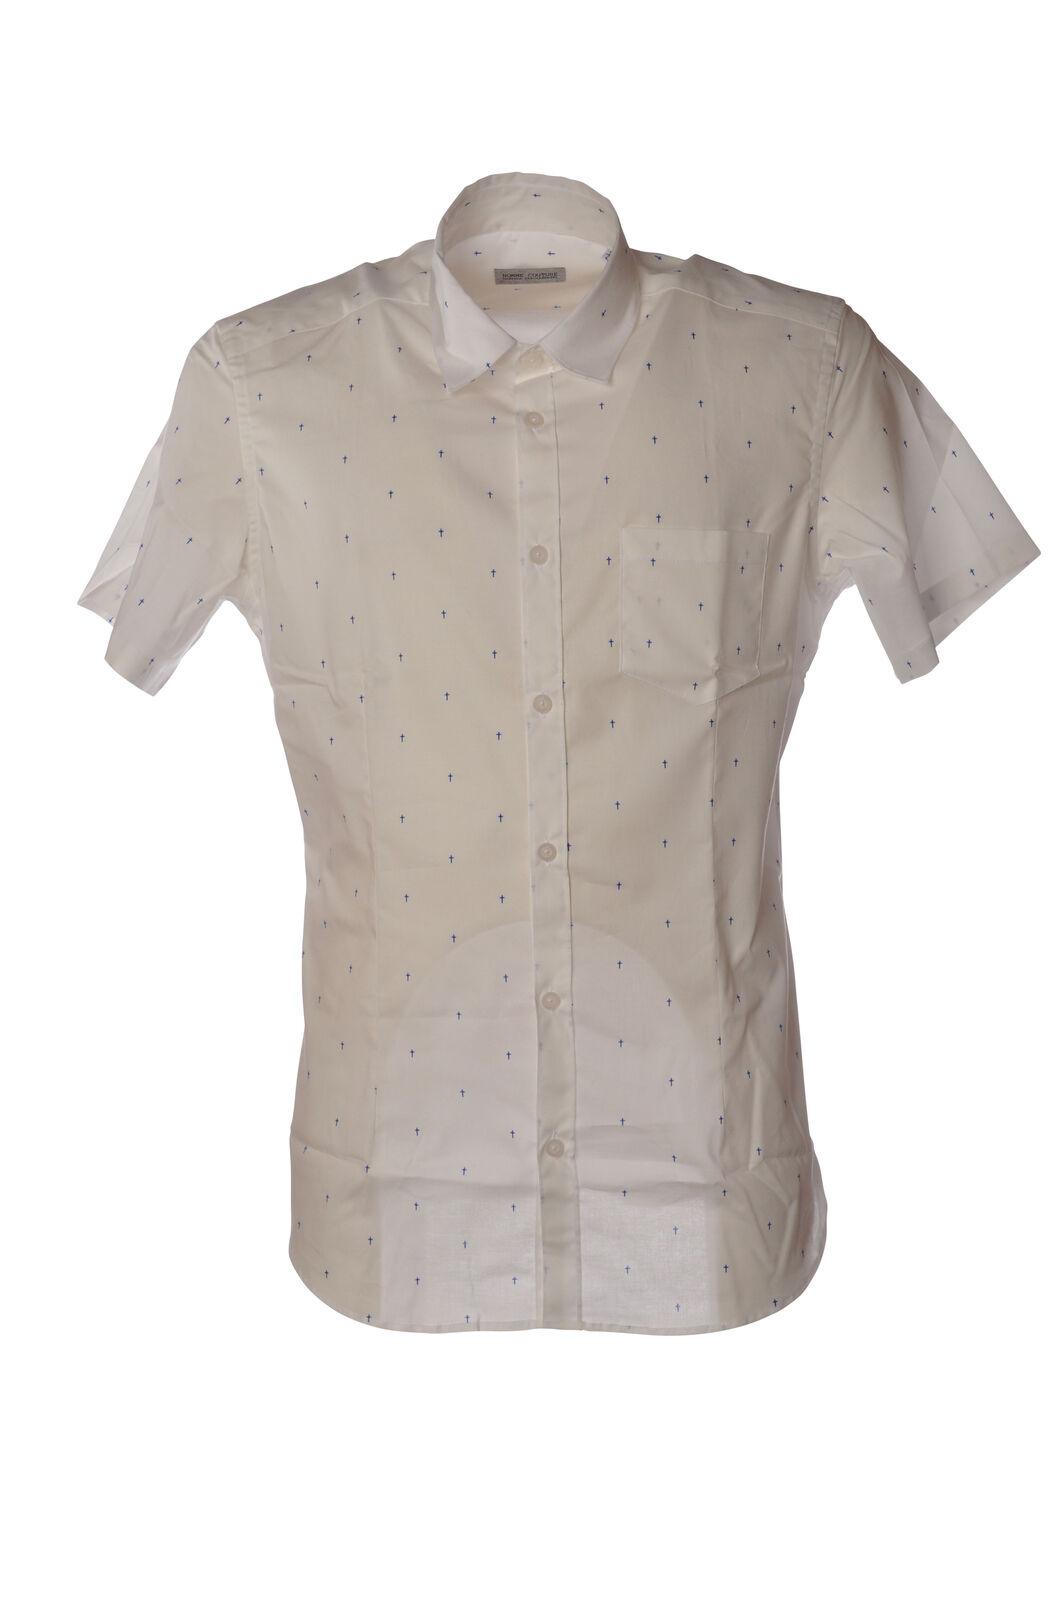 Daniele Alessandrini - Shirts-Shirts - Man - Weiß - 5218031G184758